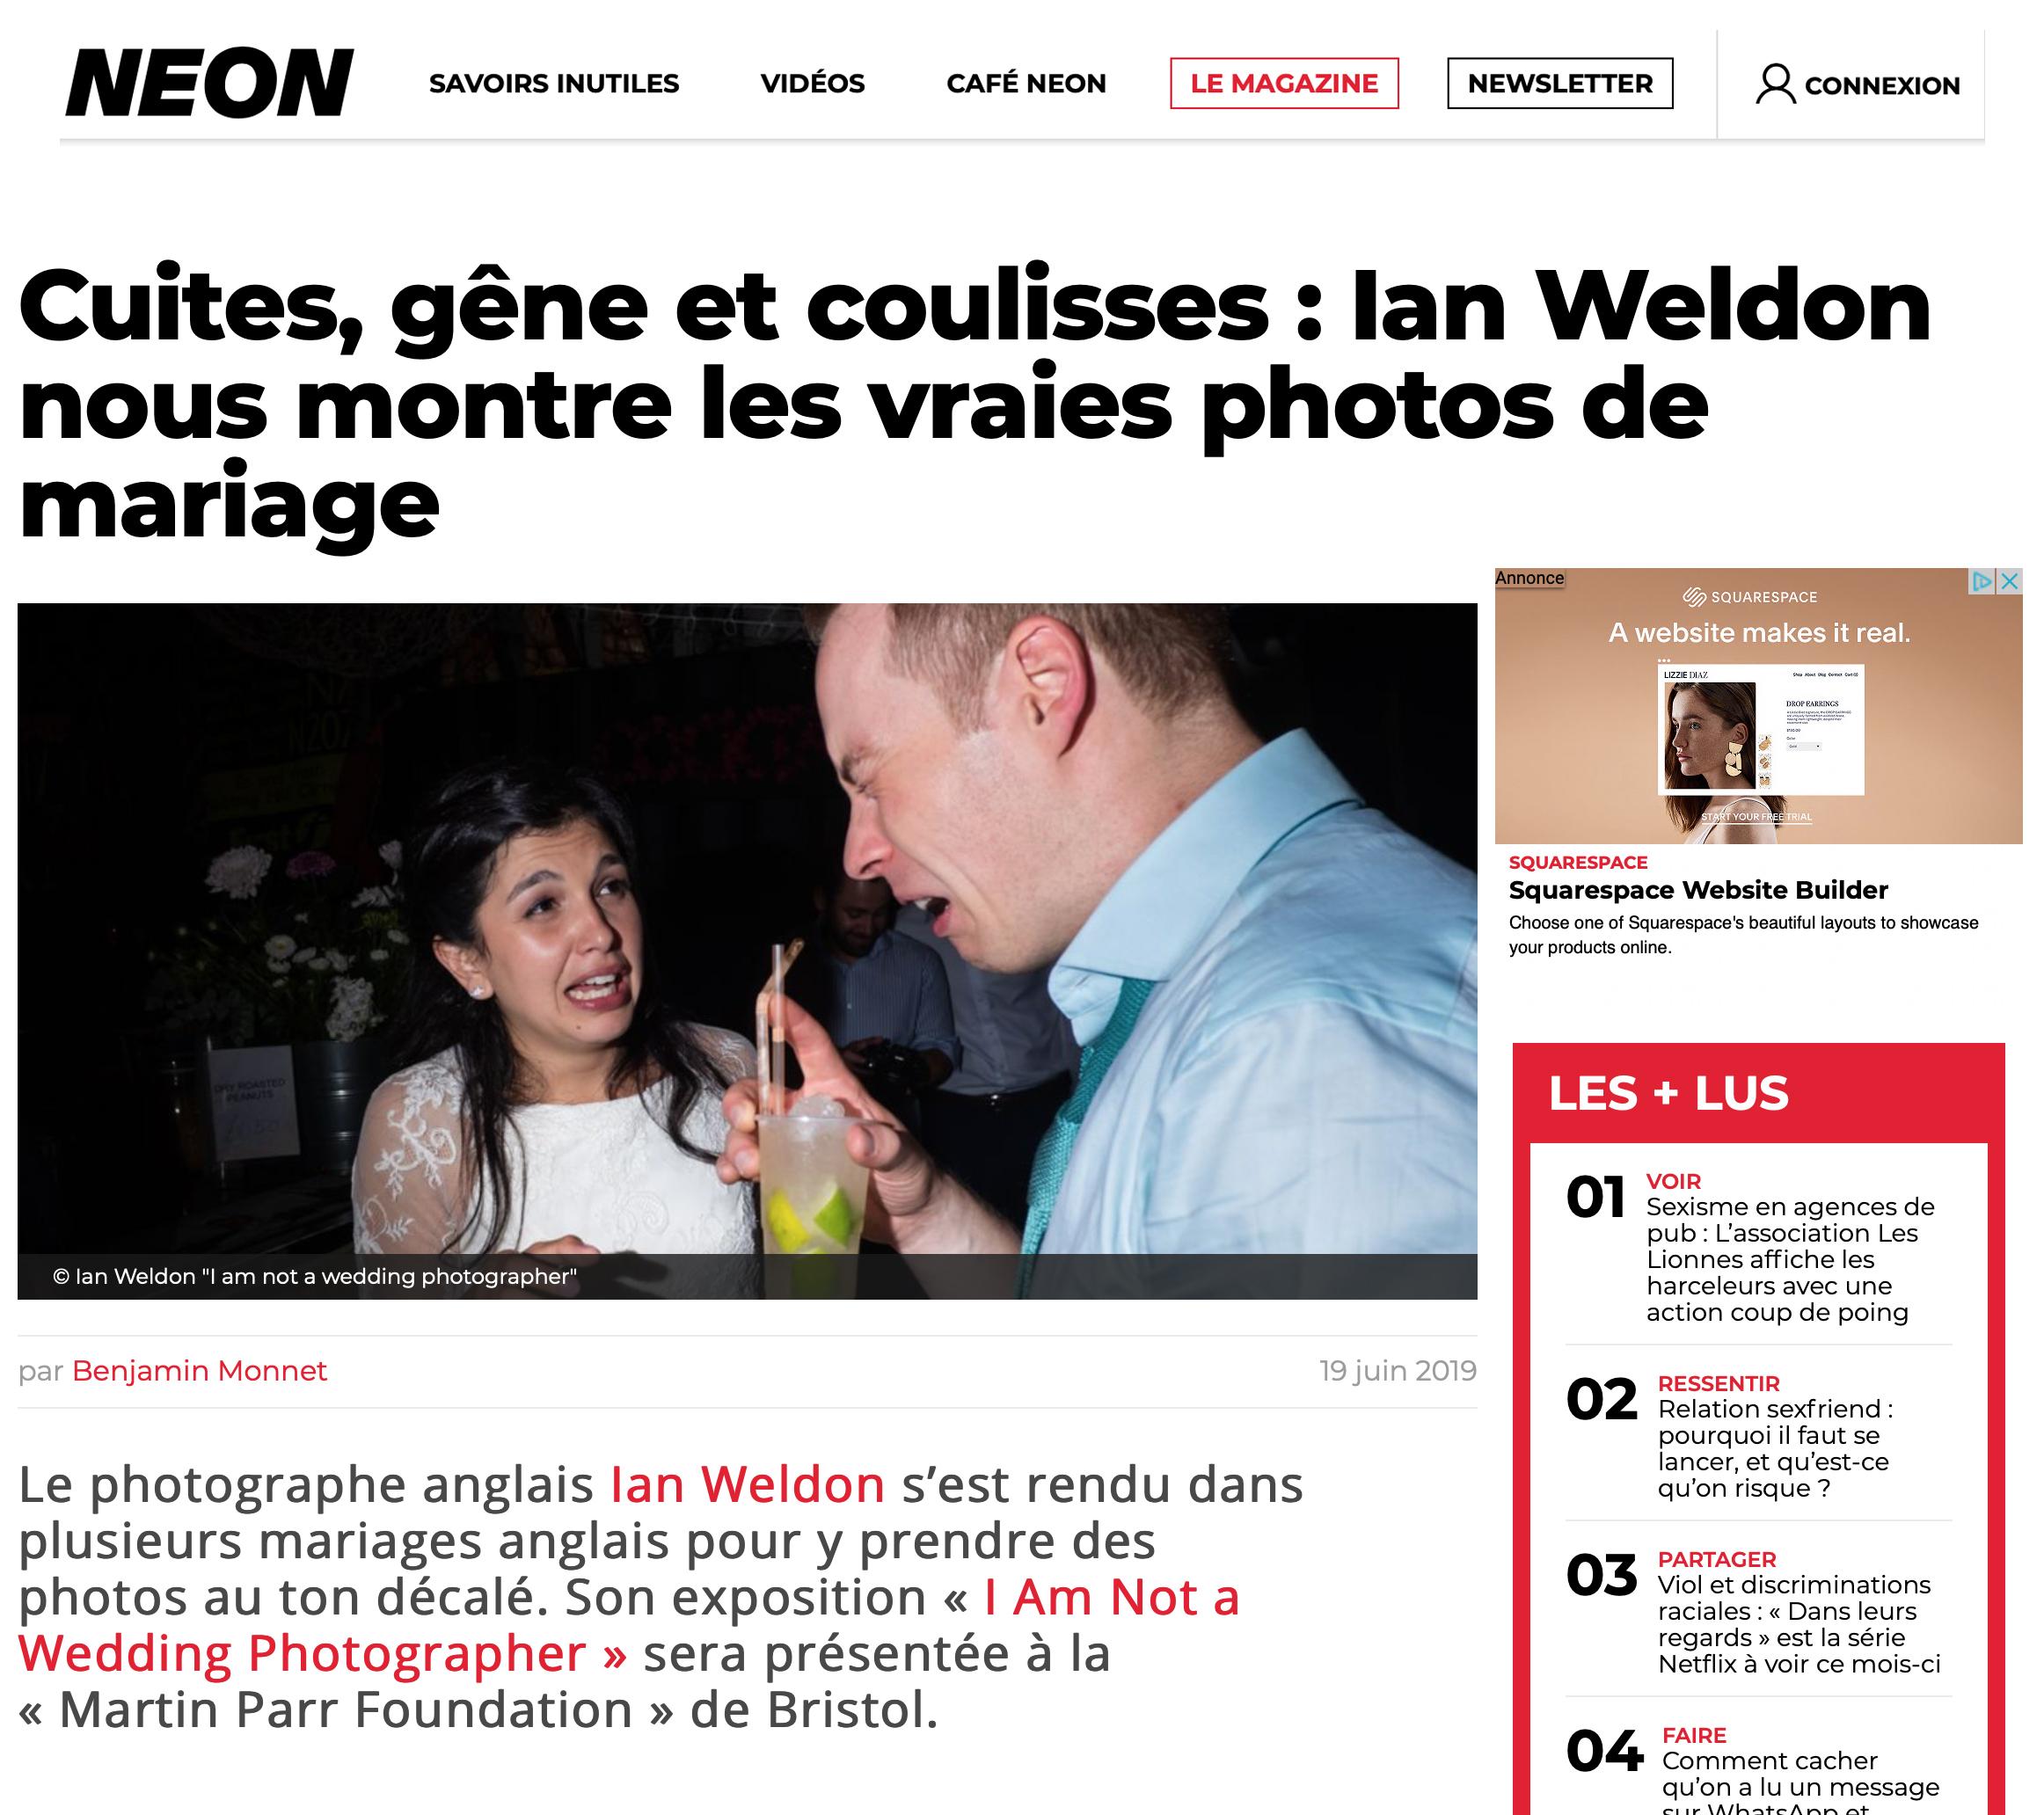 NEON - France